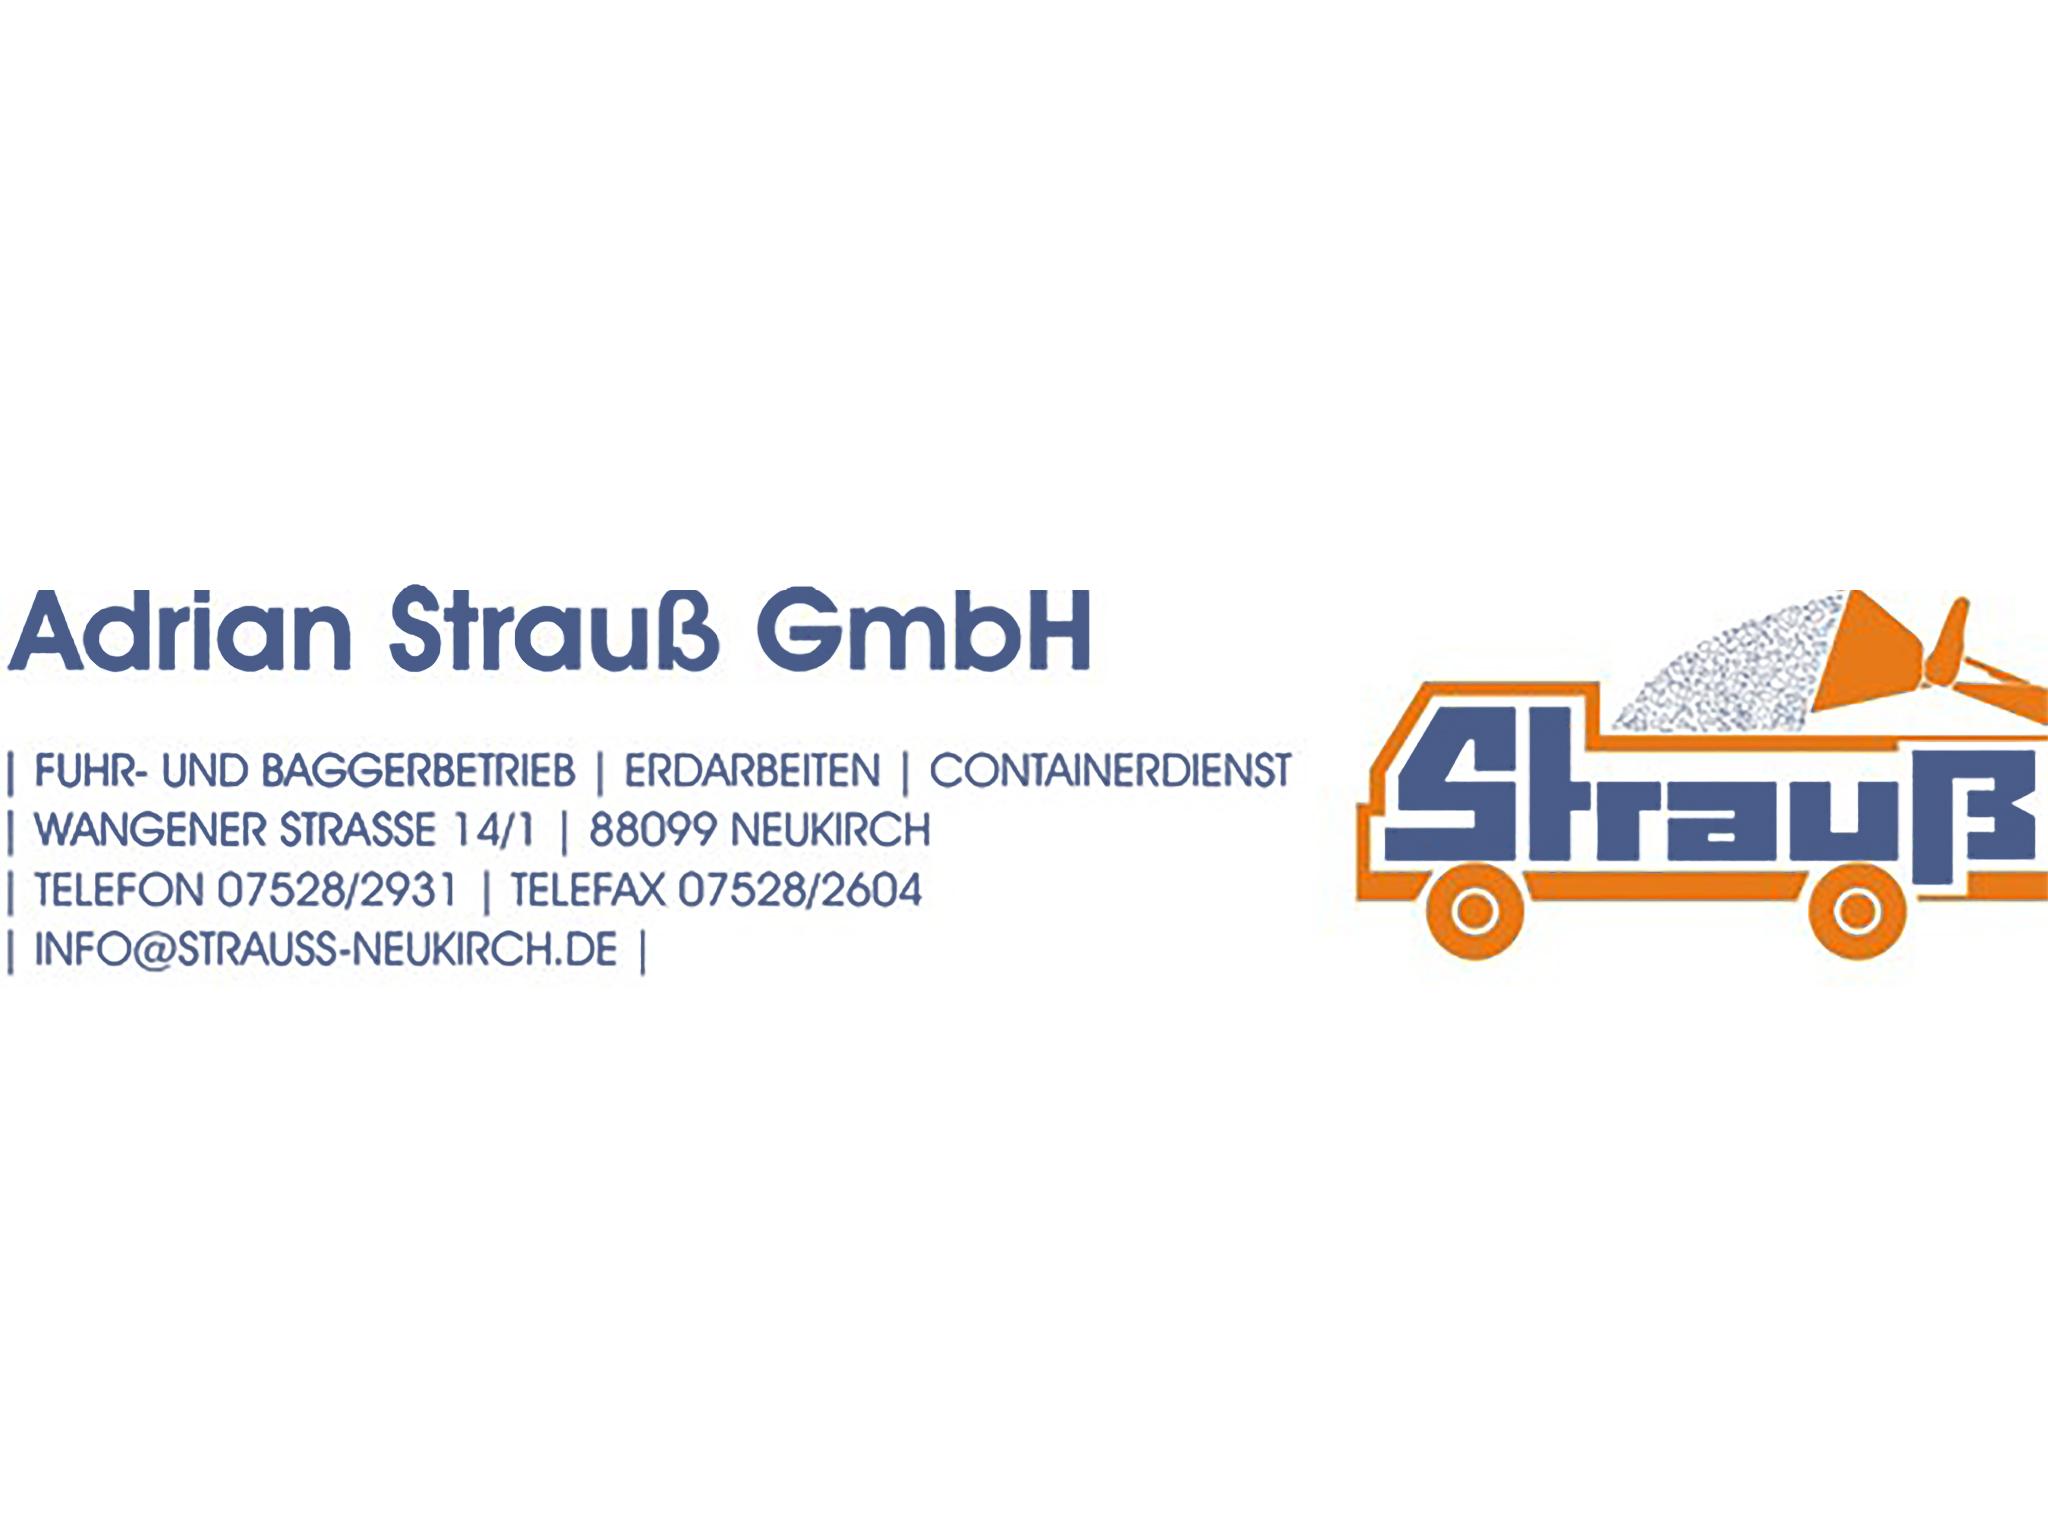 Adrian Strauß GmbH